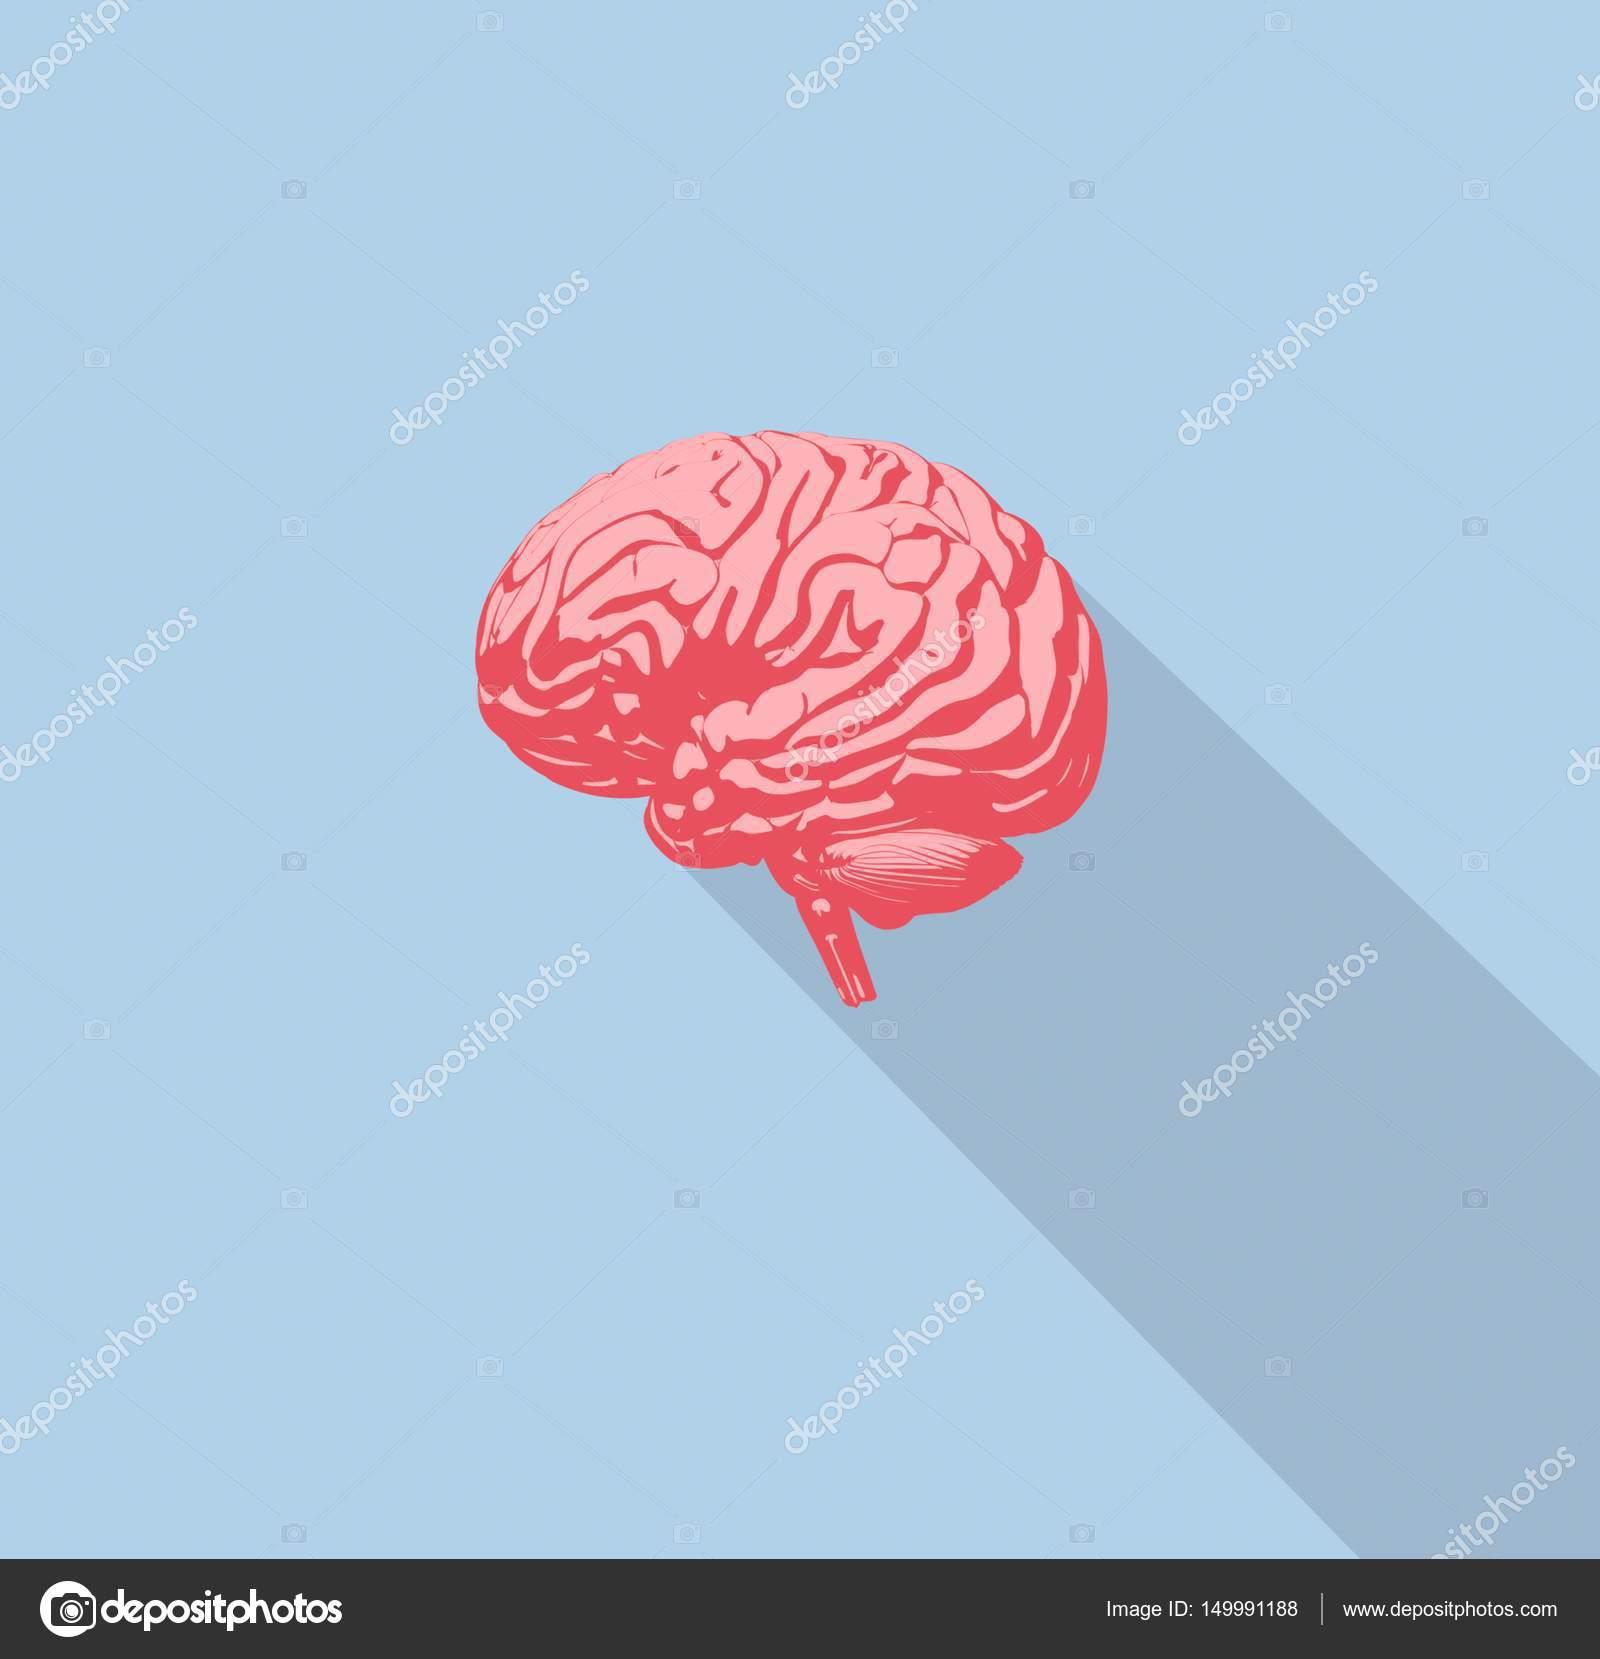 Human Brain Anatomy Model Icon Stock Photo Anatomyinsider 149991188